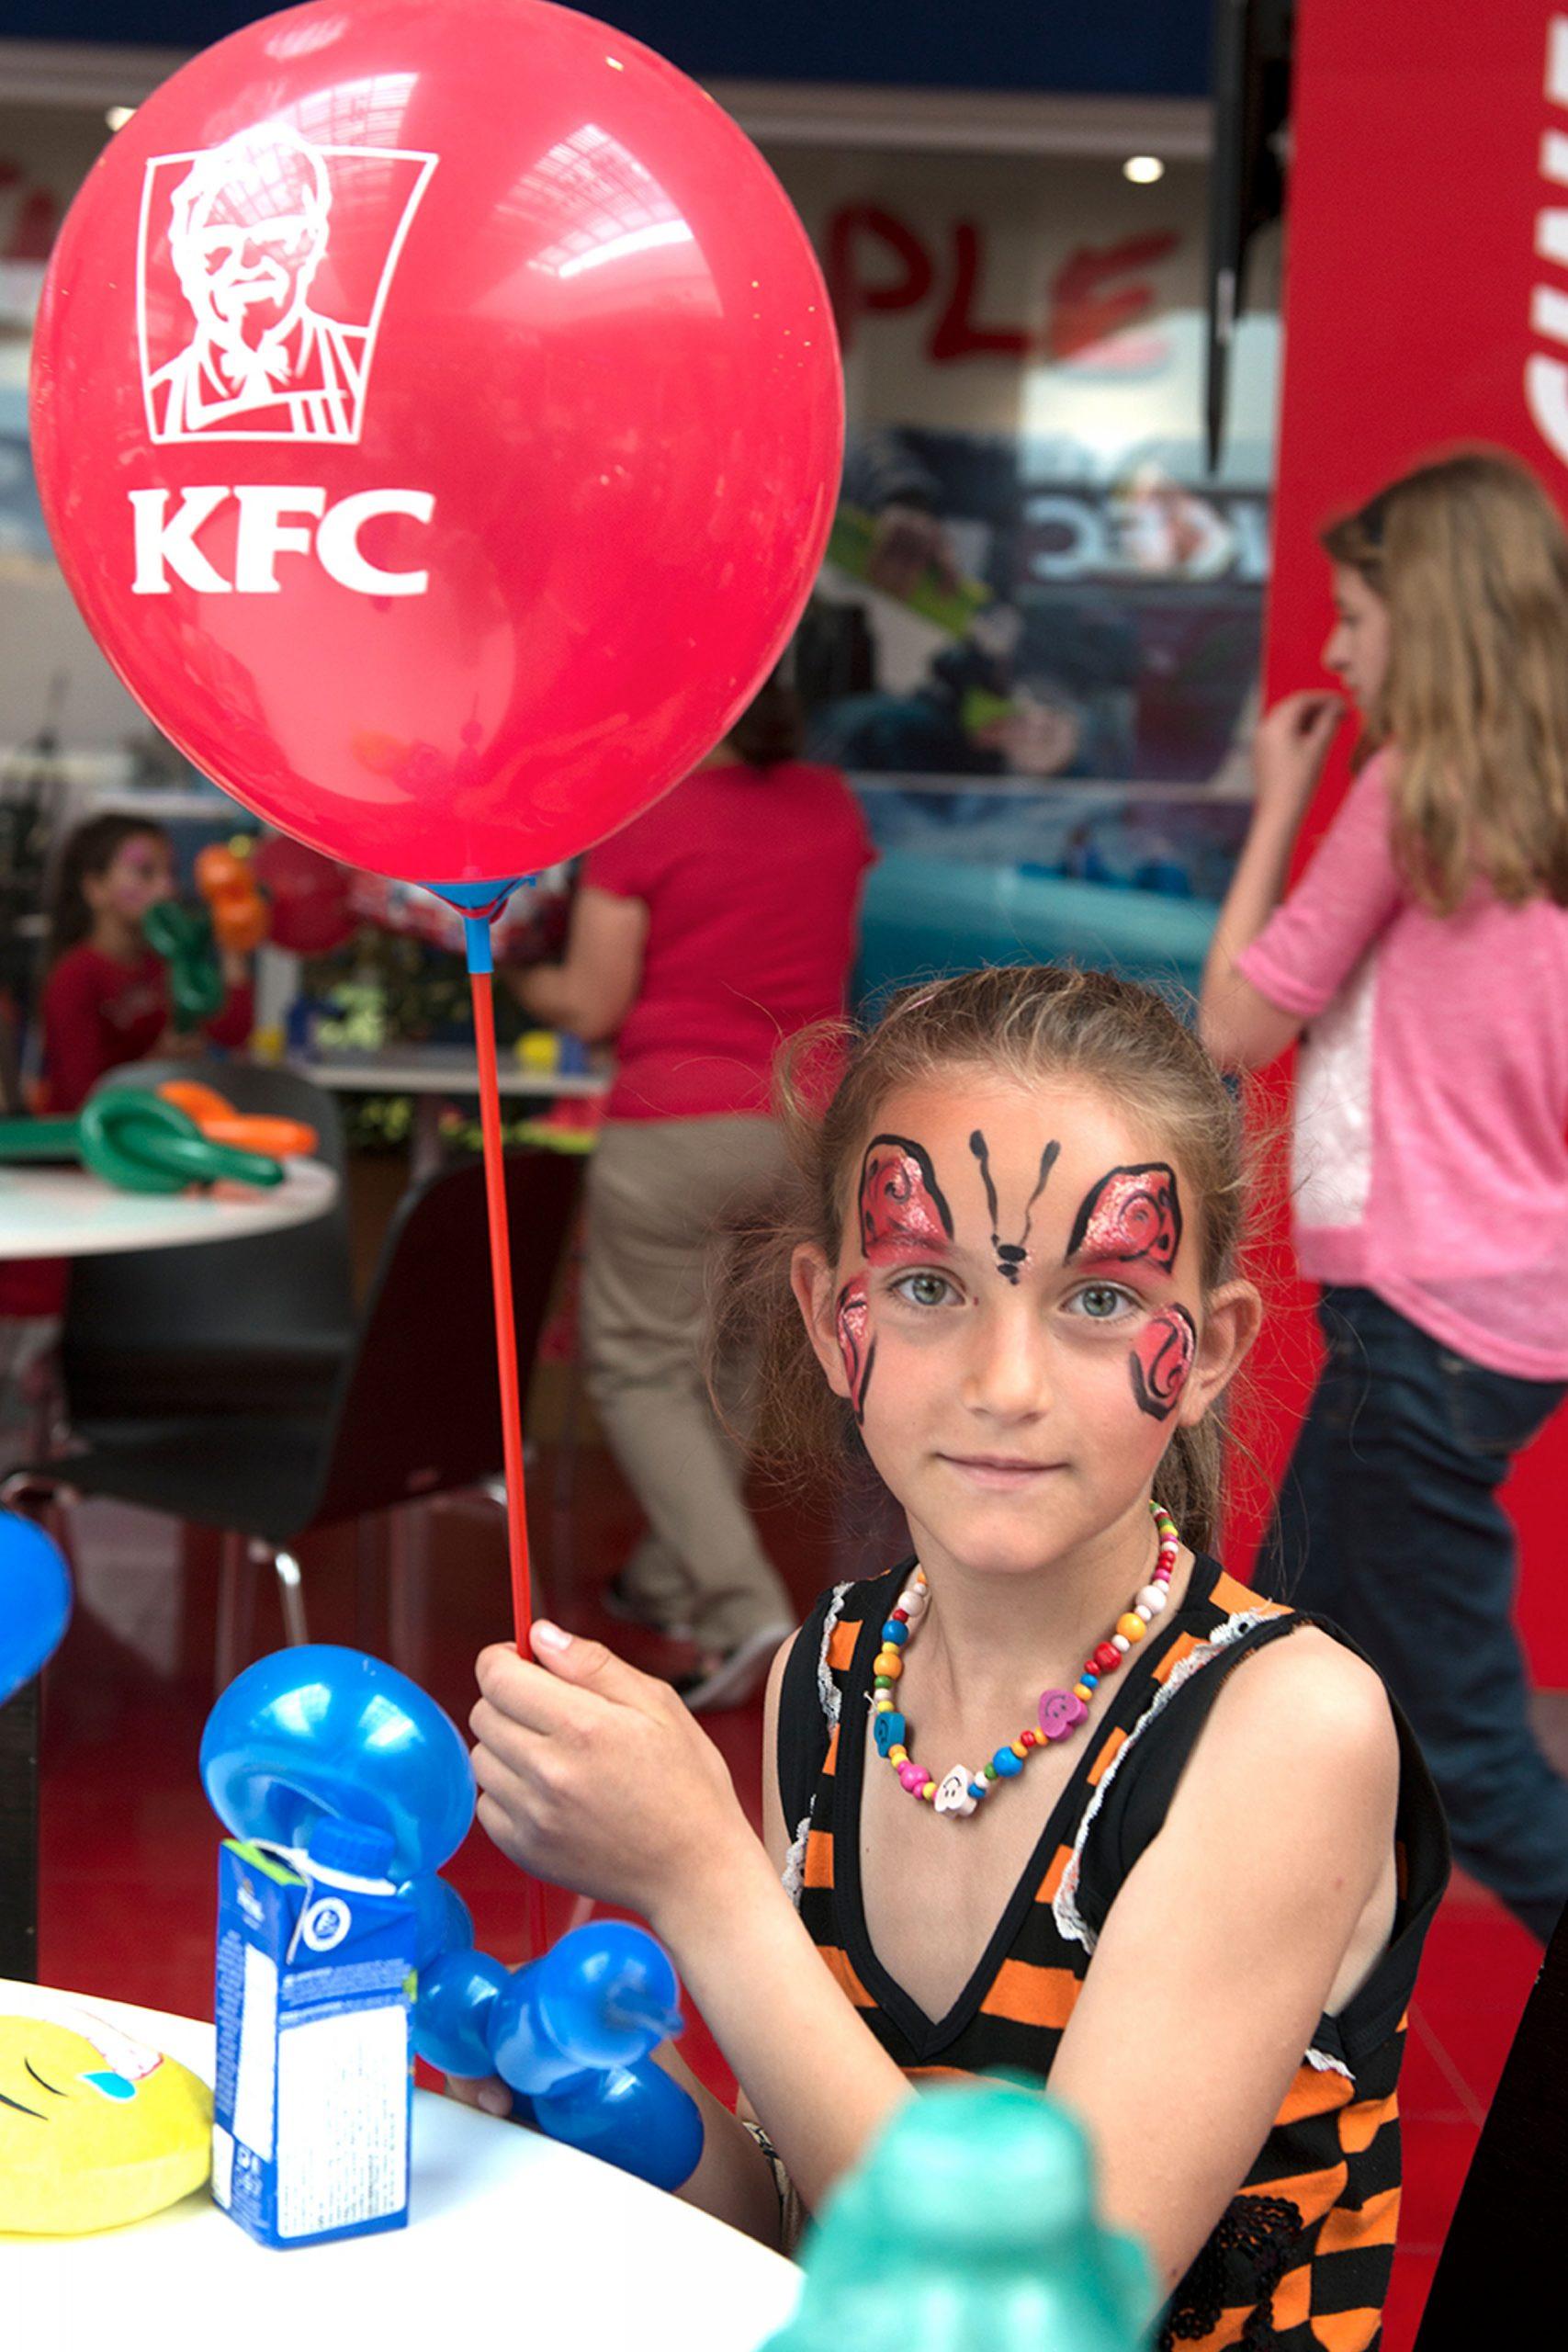 KFC, Social, Project Img 10 - Vatra Agency / Founder & CEO Gerton Bejo